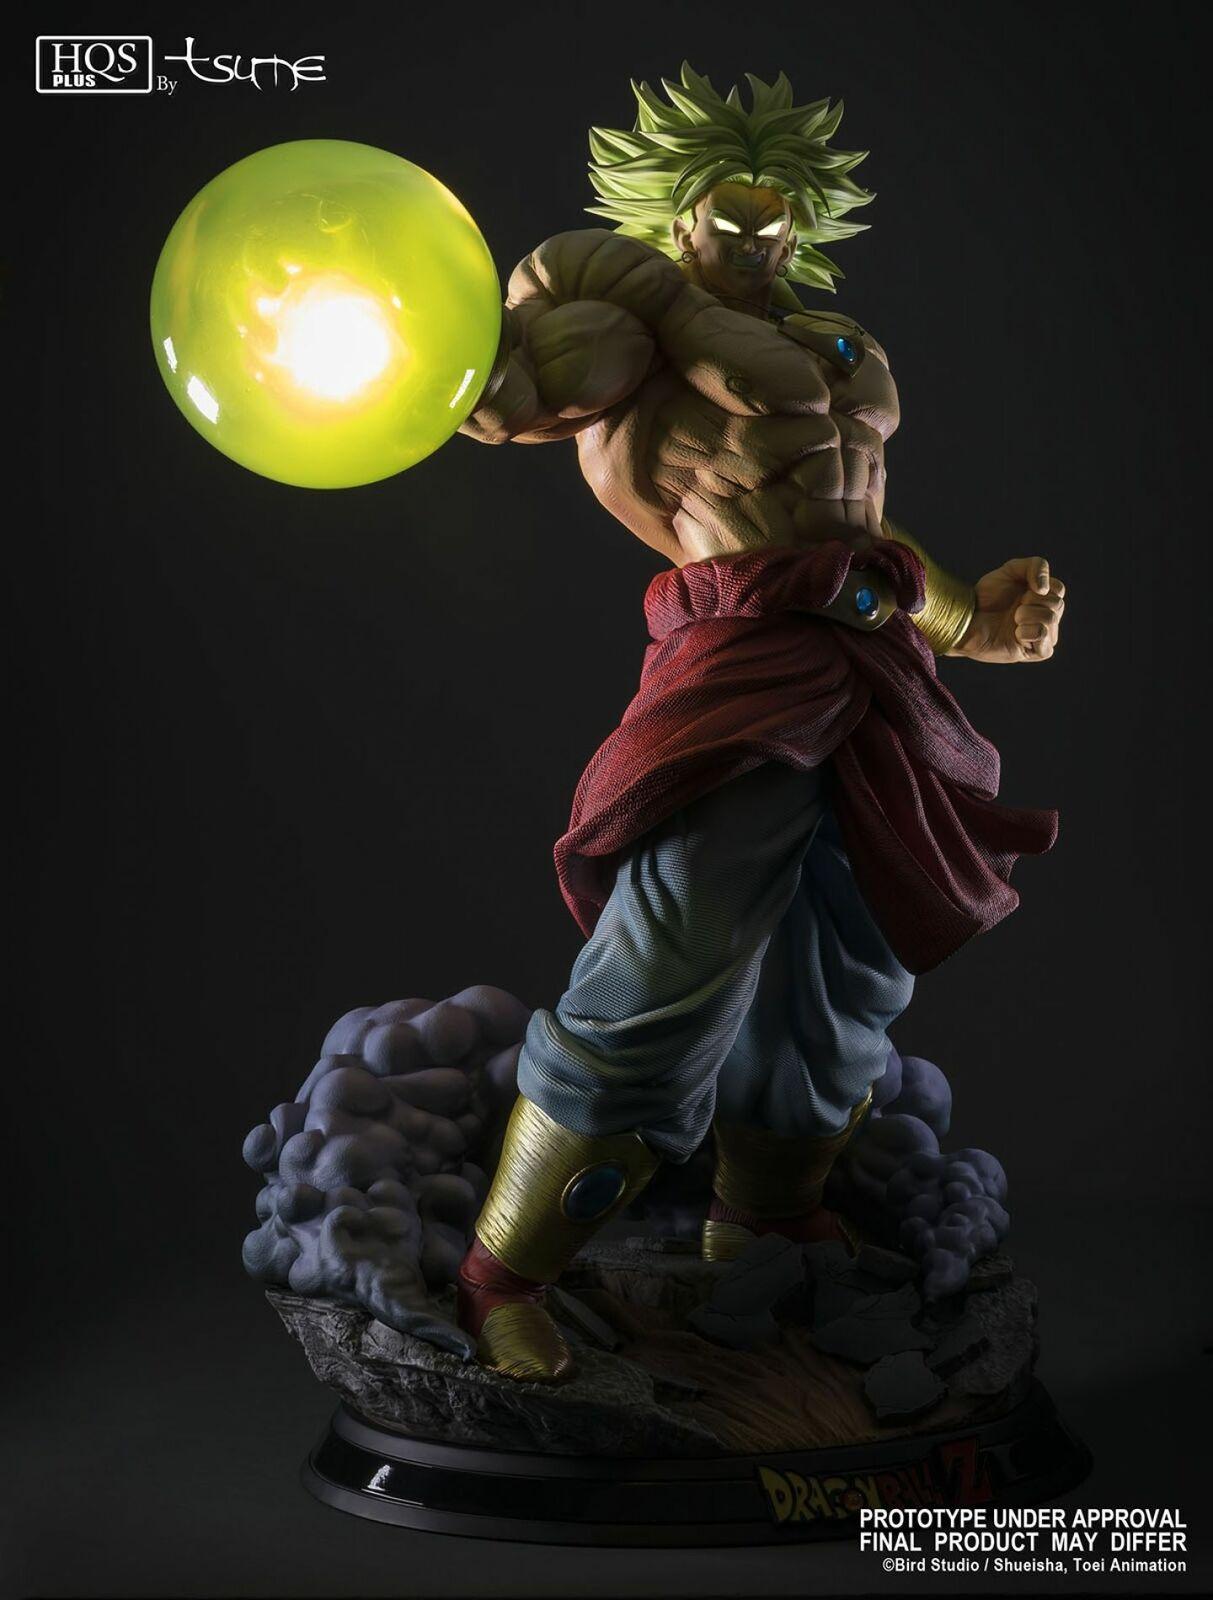 Broly - Legendary Super Saiyan King of Destruction Version HQS+ TSUME - ACCONTO